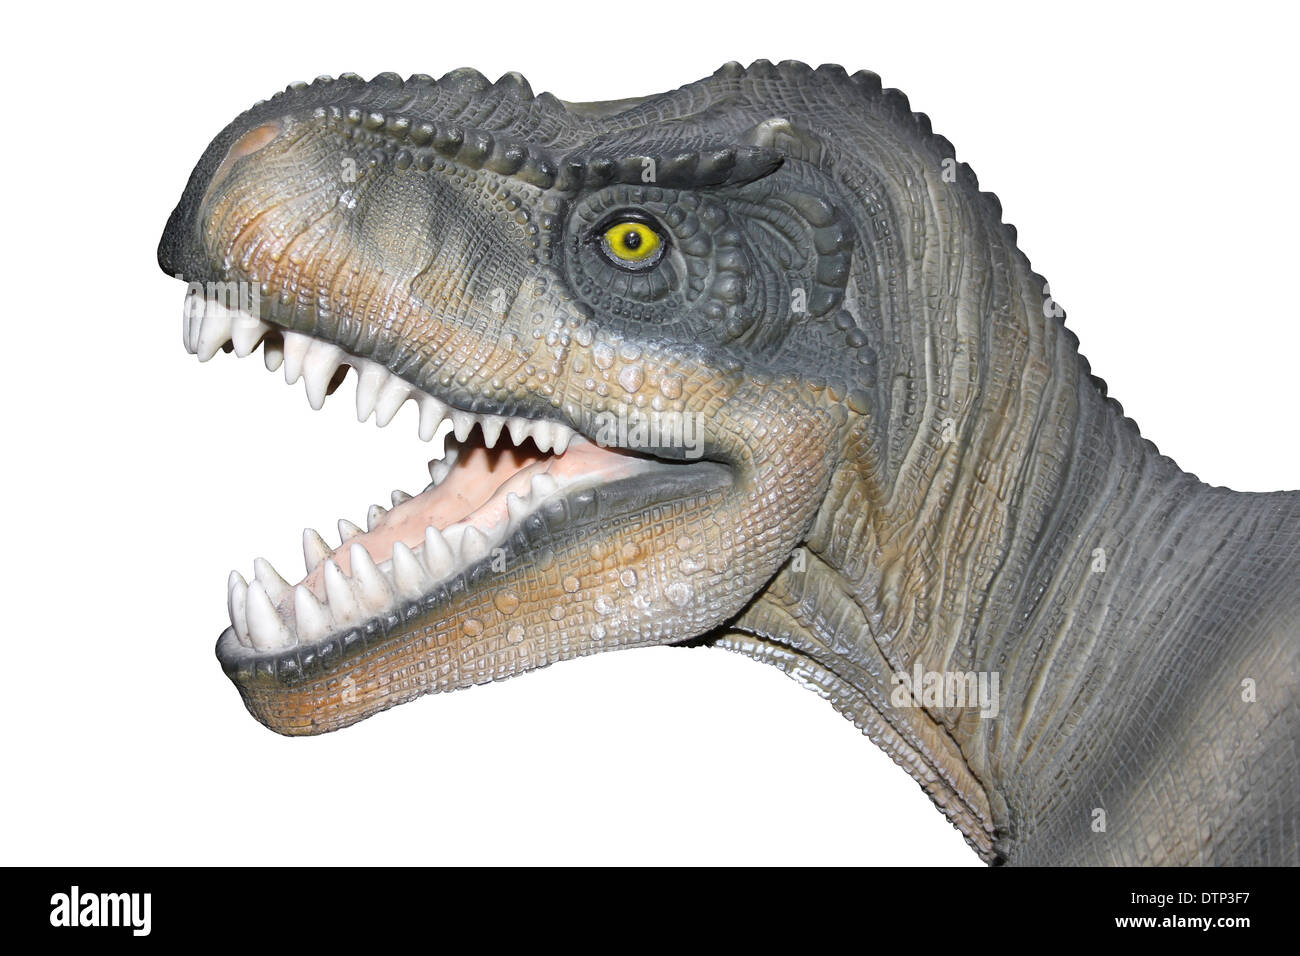 dinosaur mouth stockfotos dinosaur mouth bilder alamy. Black Bedroom Furniture Sets. Home Design Ideas